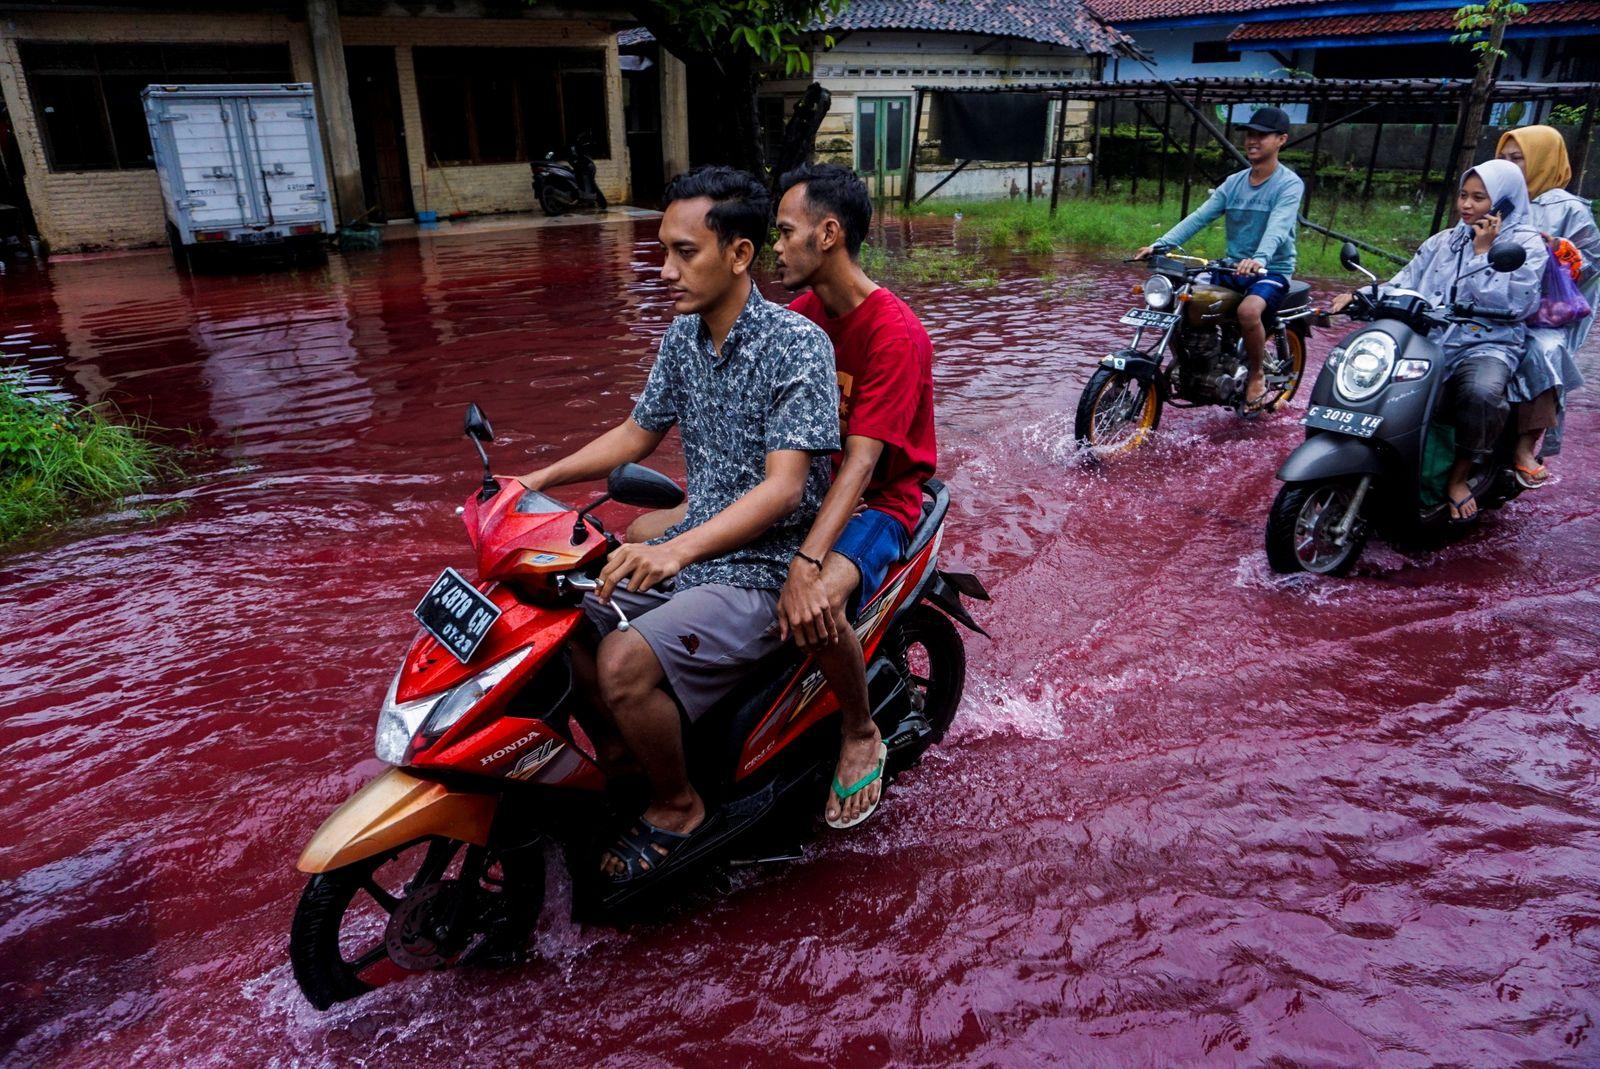 People ride motorbikes through a flooded road in Pekalongan